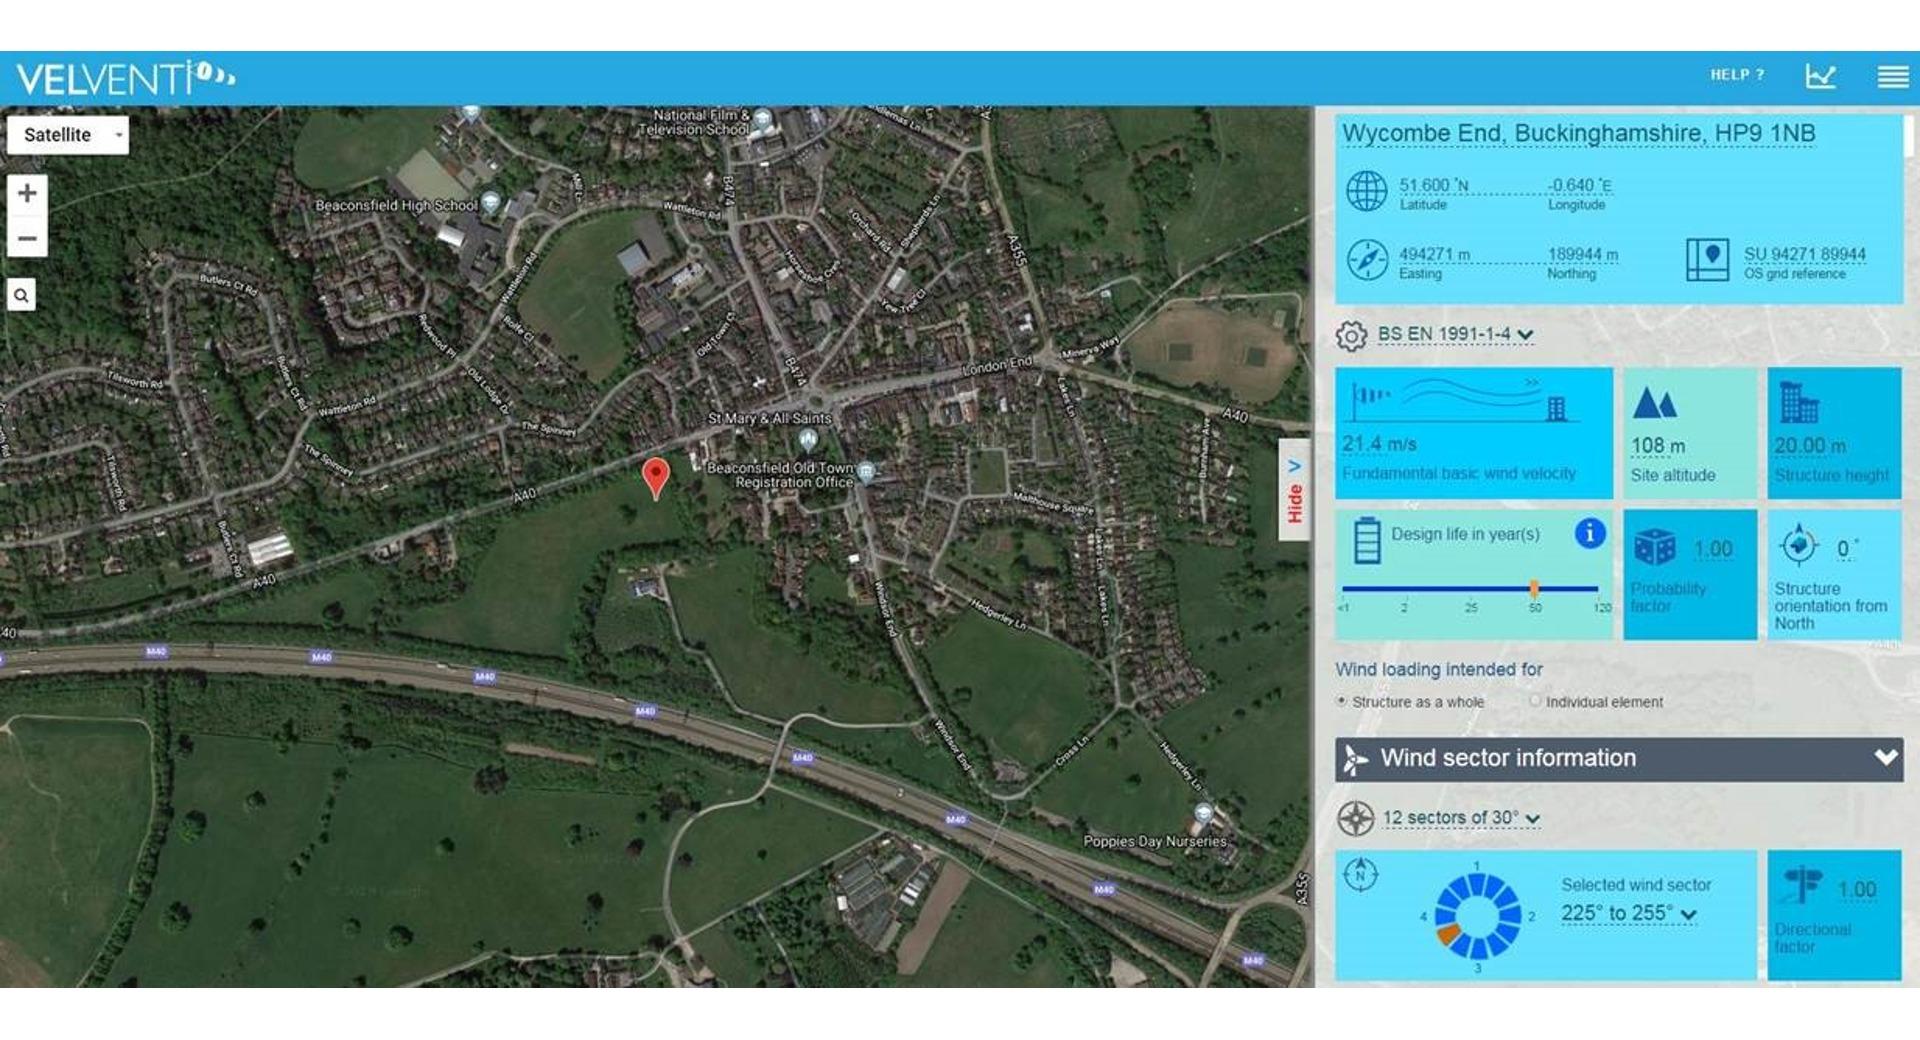 VelVenti wind speed and satellite image